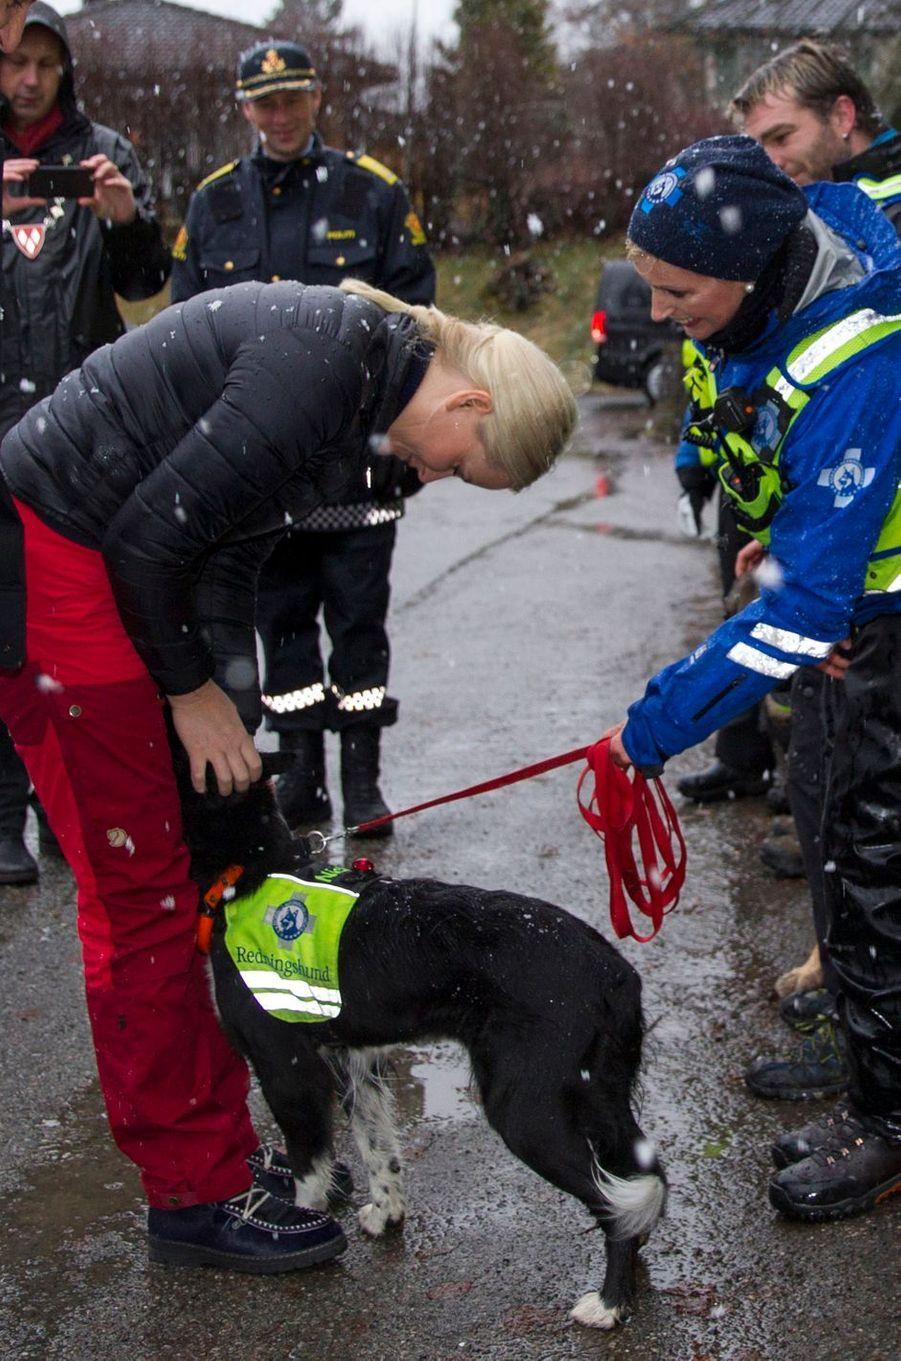 Mette Marit Haakon Norvege À Ski 11 Janv 2017 6